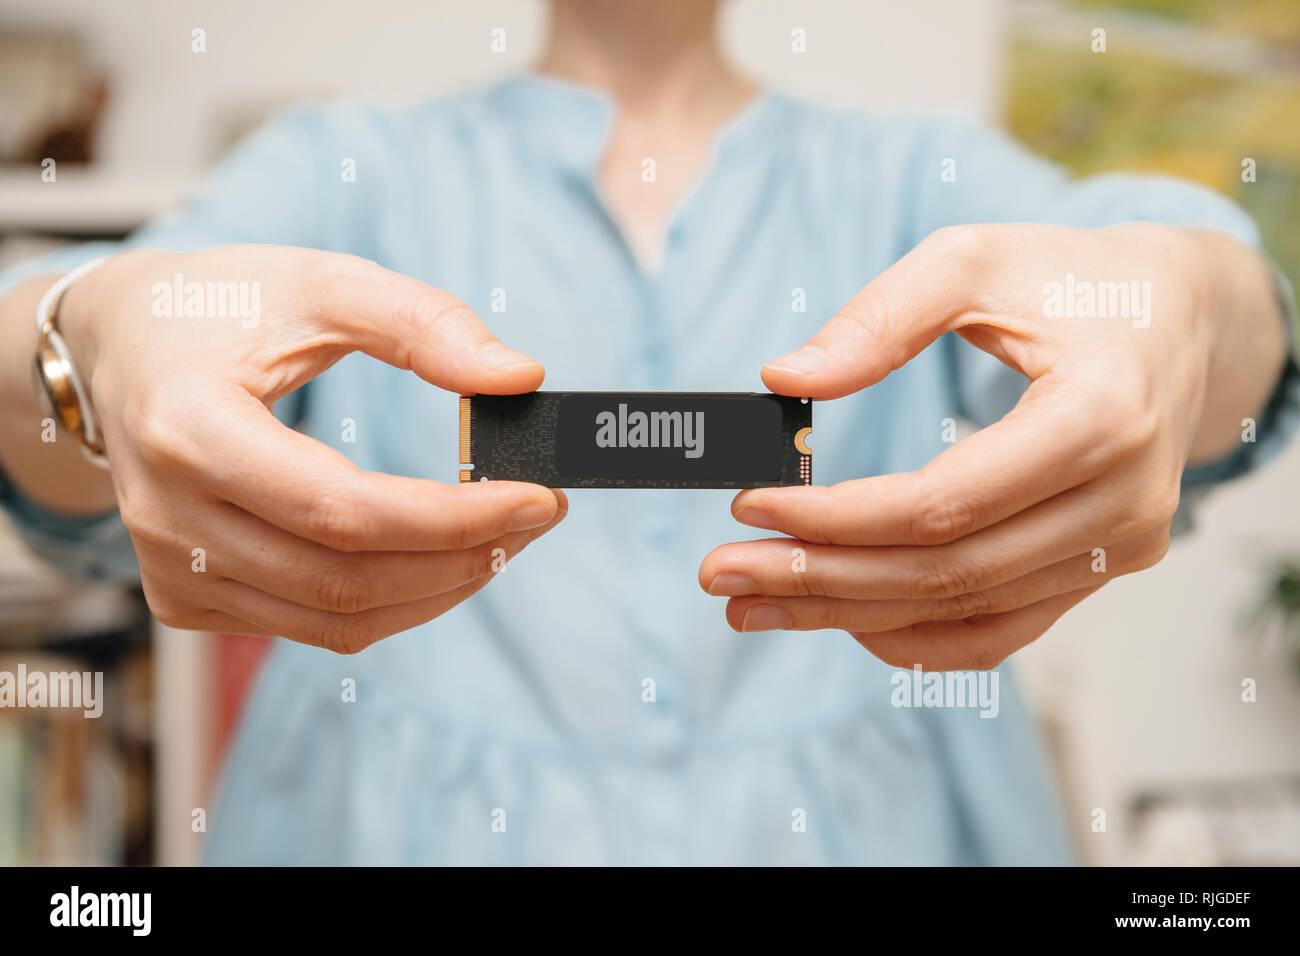 Nvme Stock Photos & Nvme Stock Images - Alamy